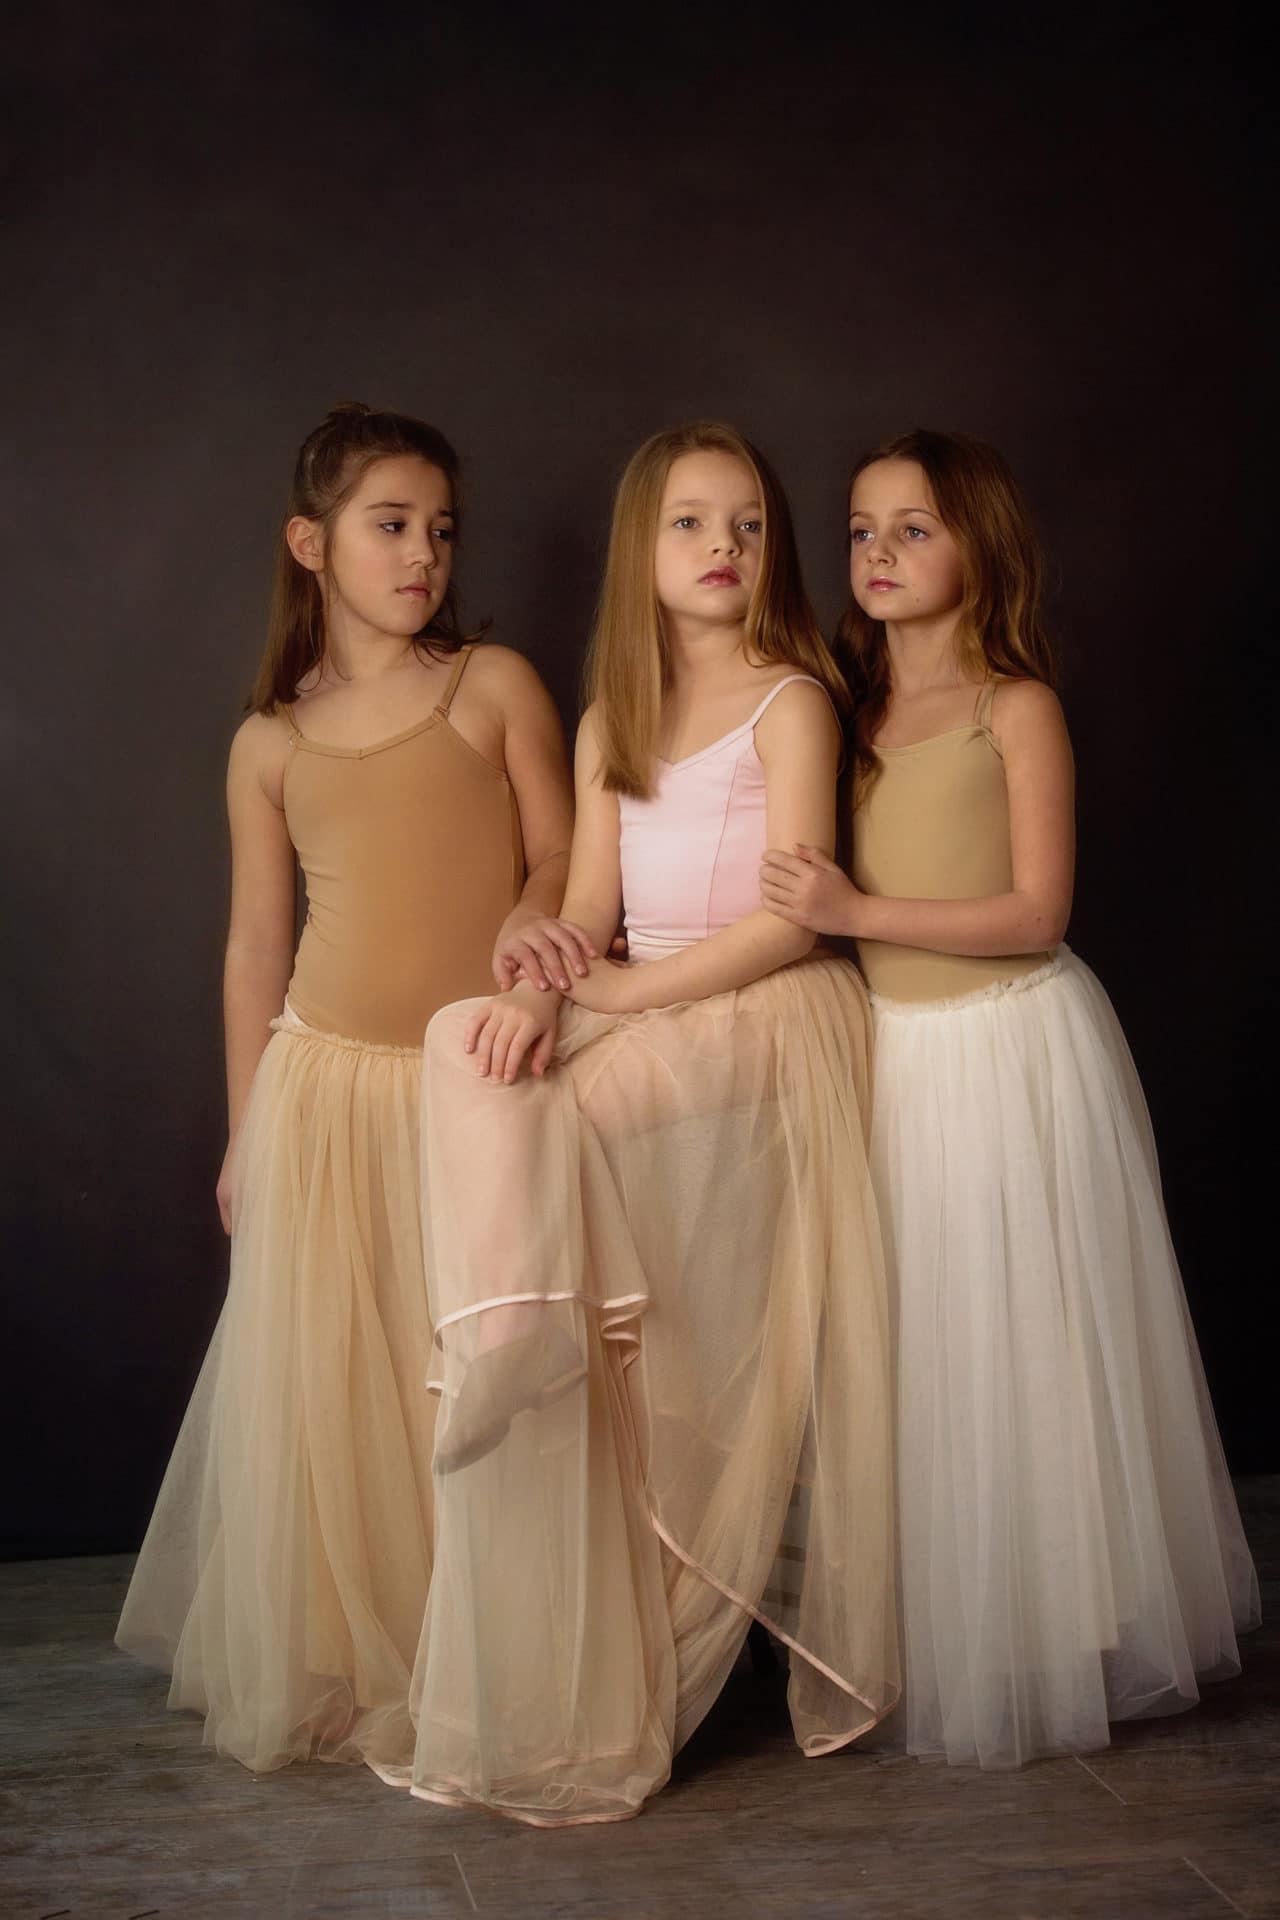 roswell portraits studio, dancers, dance portraits